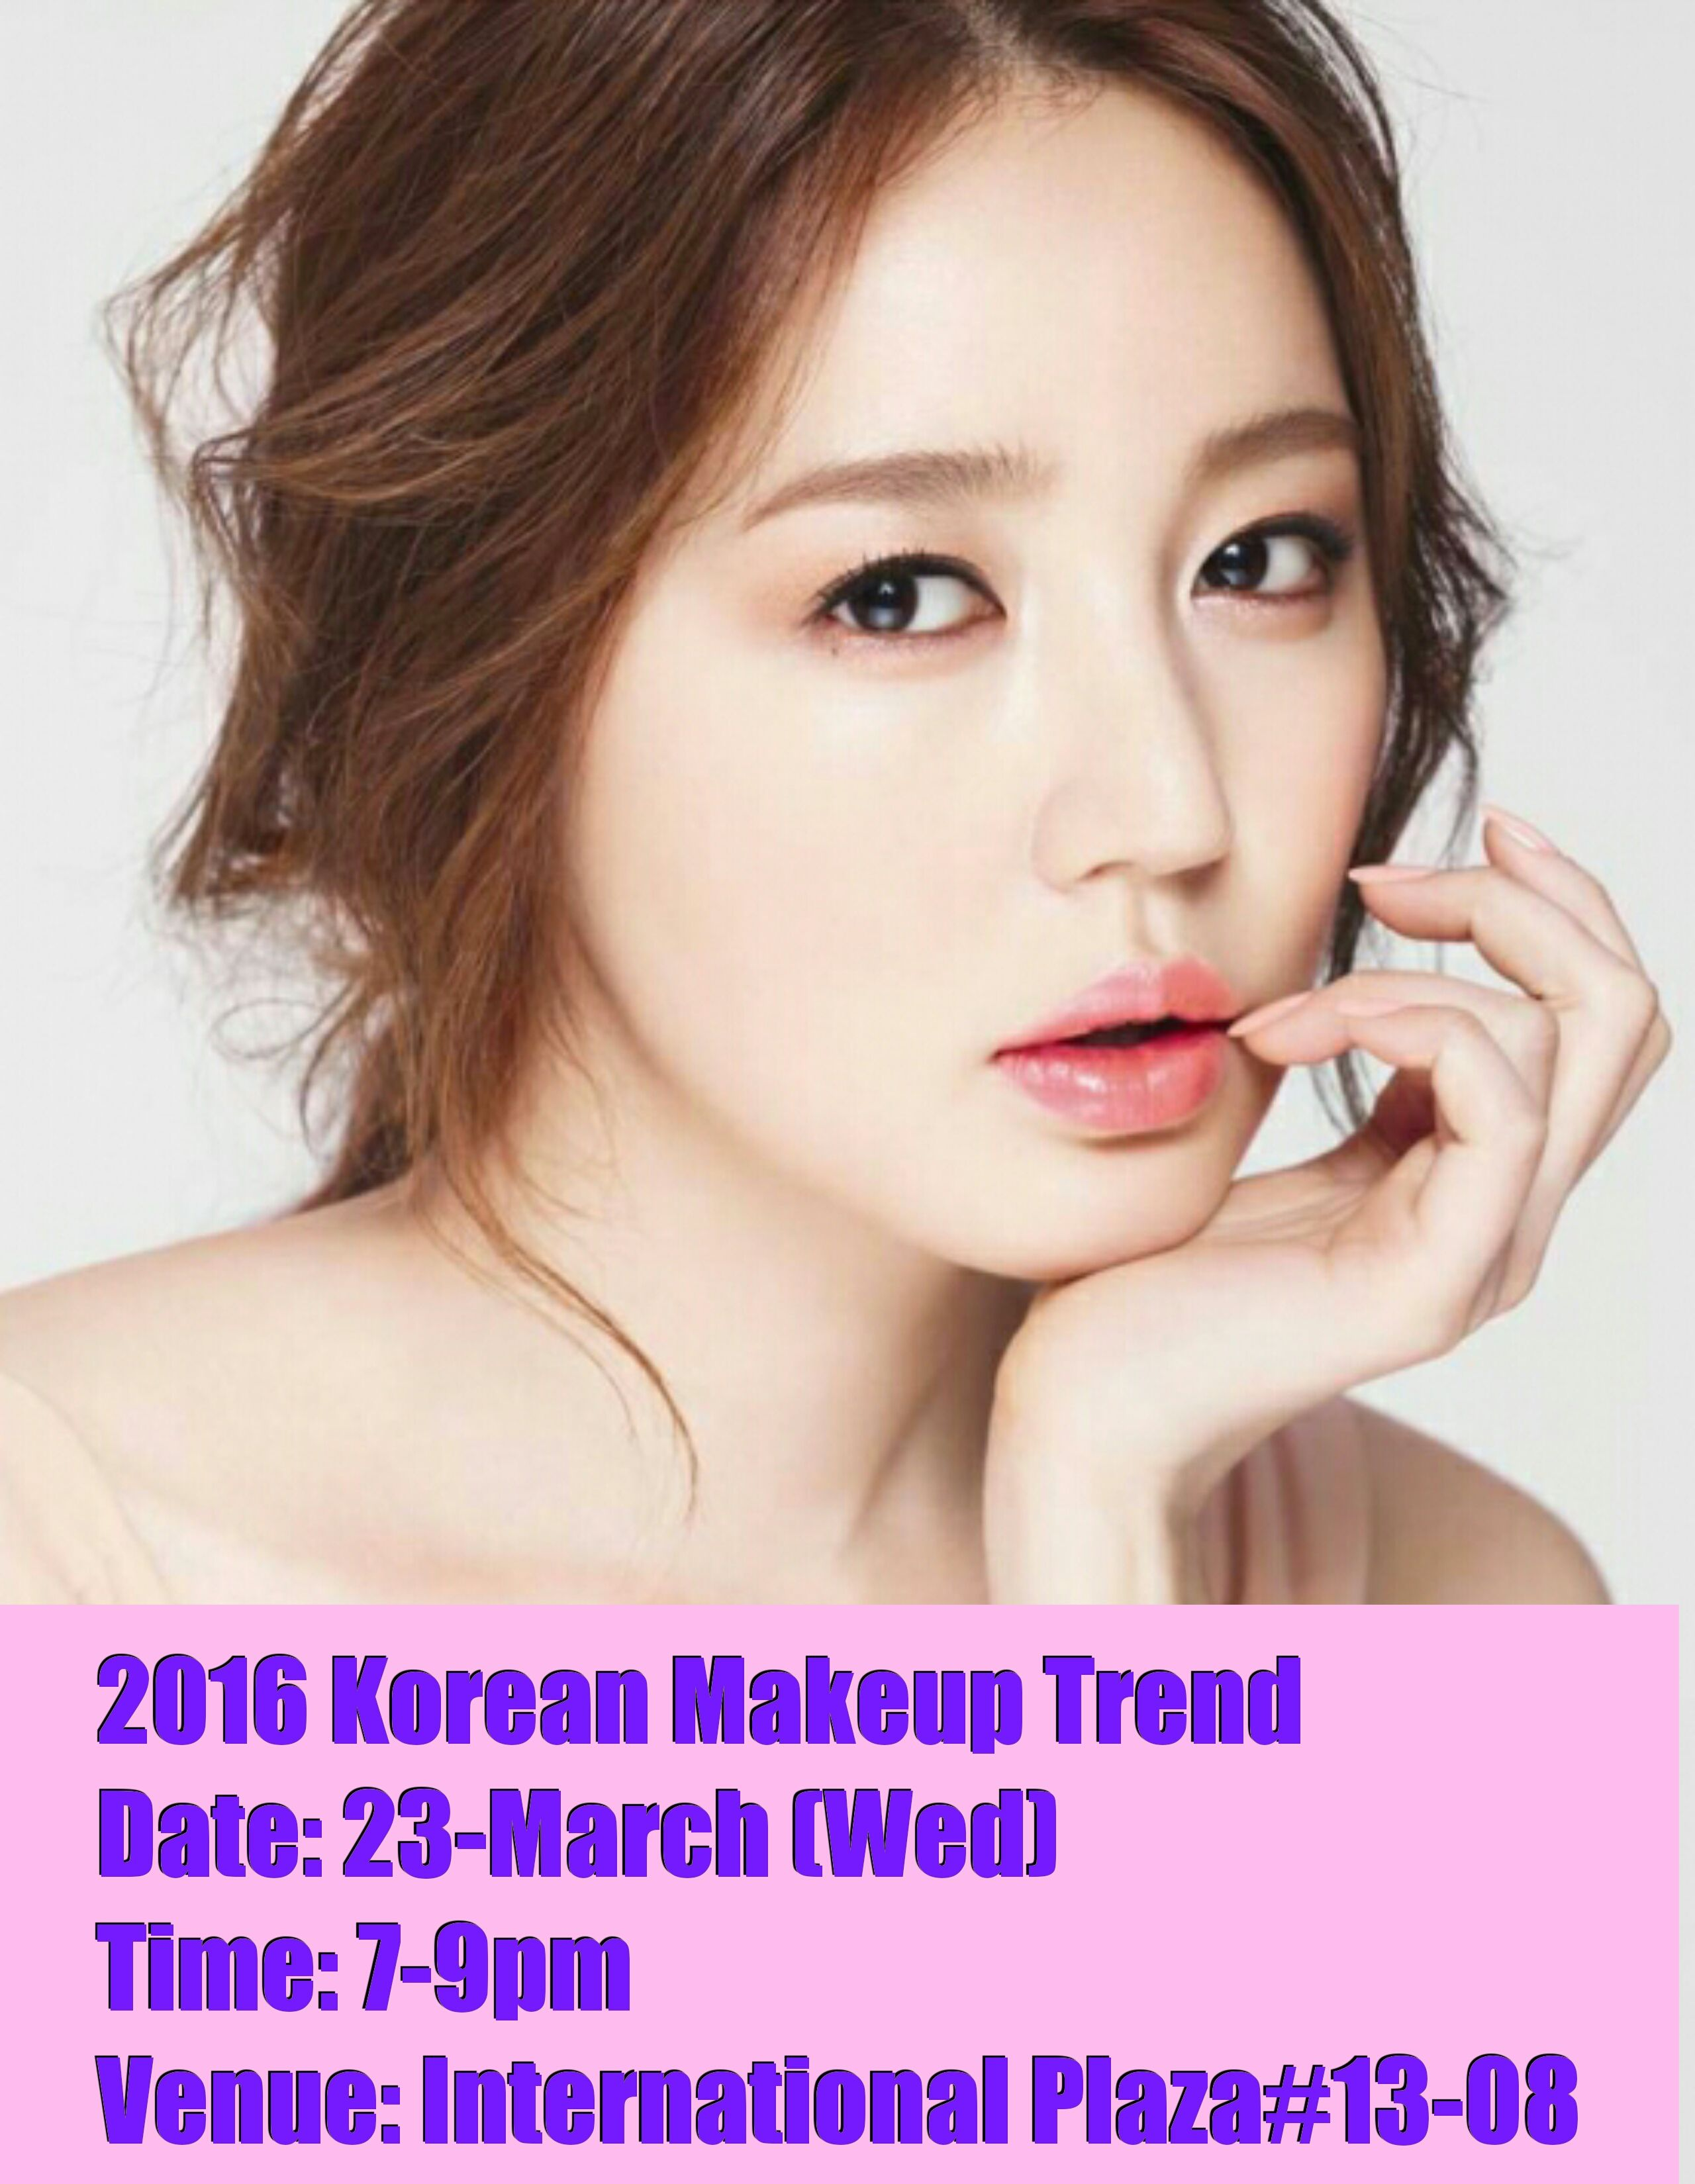 Korean Makeup Games Style Guru Fashion Glitz Glamour